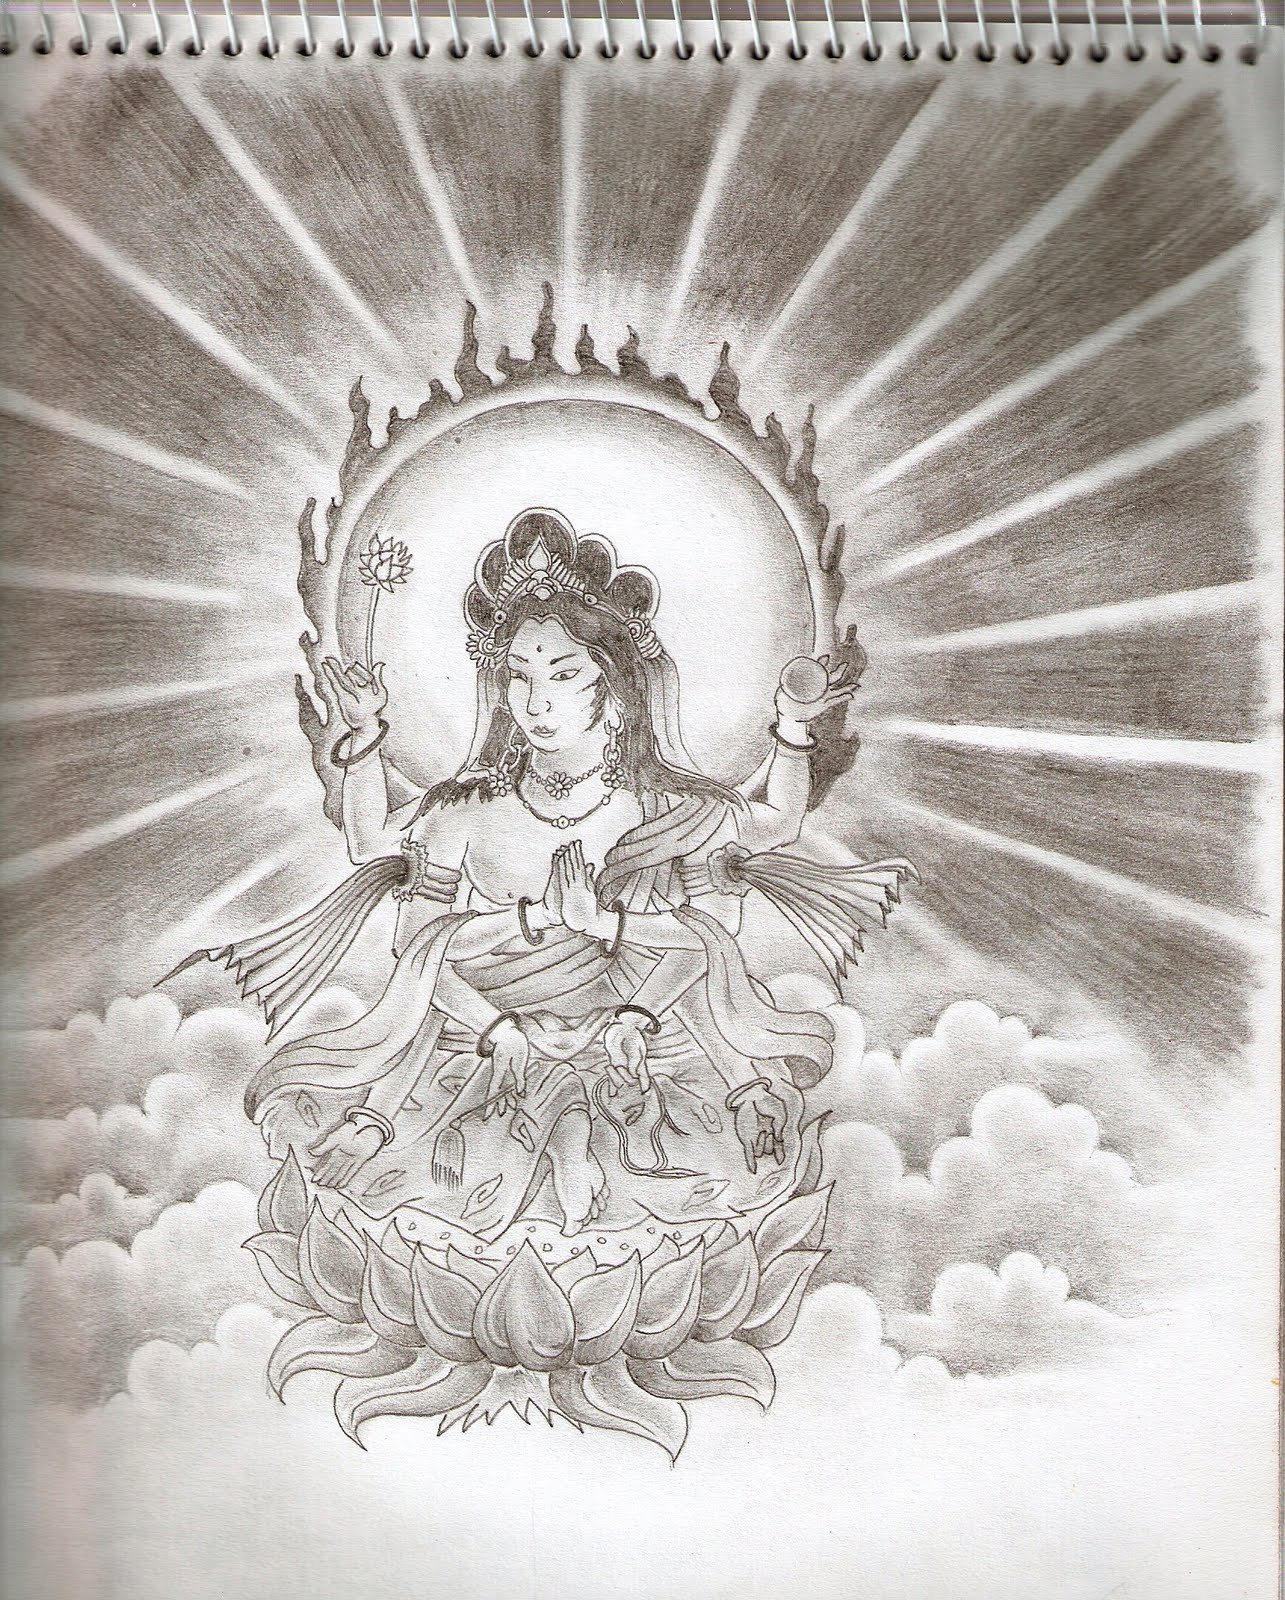 http://4.bp.blogspot.com/-hLCA_FId6UQ/TgdkLnFCFII/AAAAAAAAD7Y/ff0nxIHKSaA/s1600/religi%25C3%25A3o+oriental_tattoo_by_maderpacker.jpg